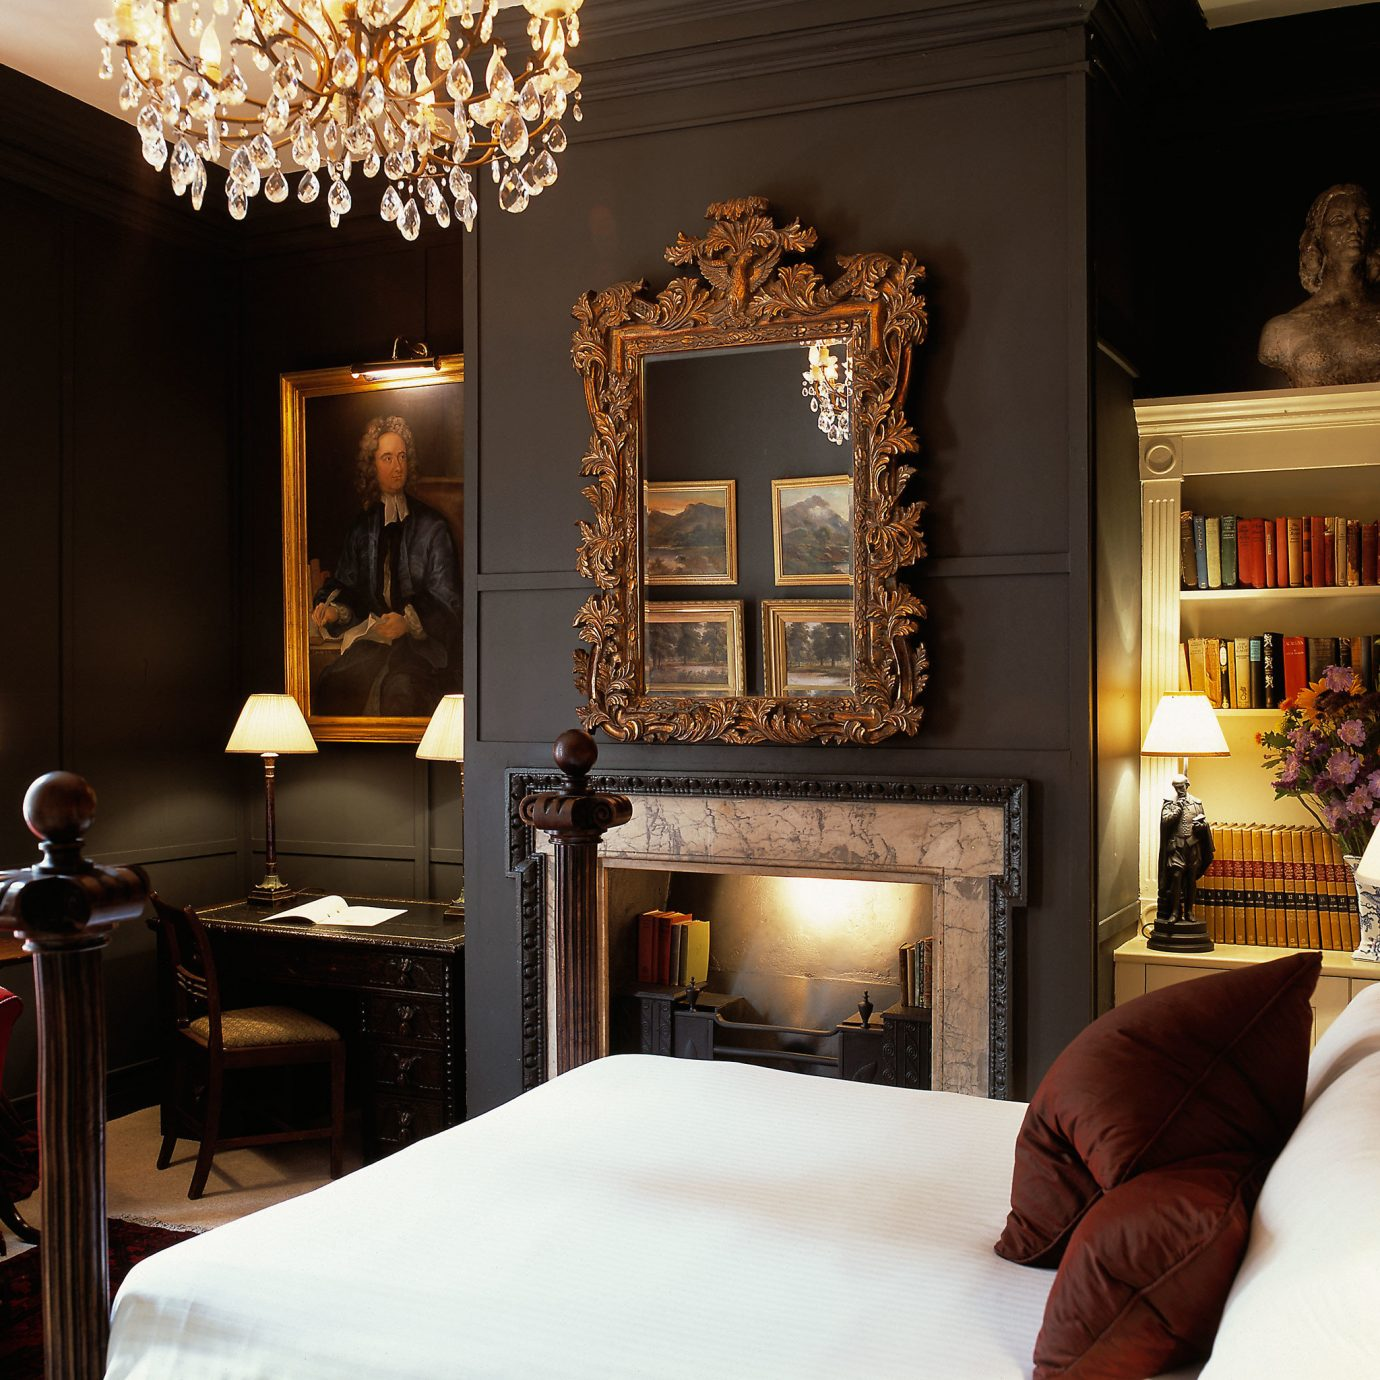 Bedroom Classic Elegant Historic Luxury Suite living room home scene